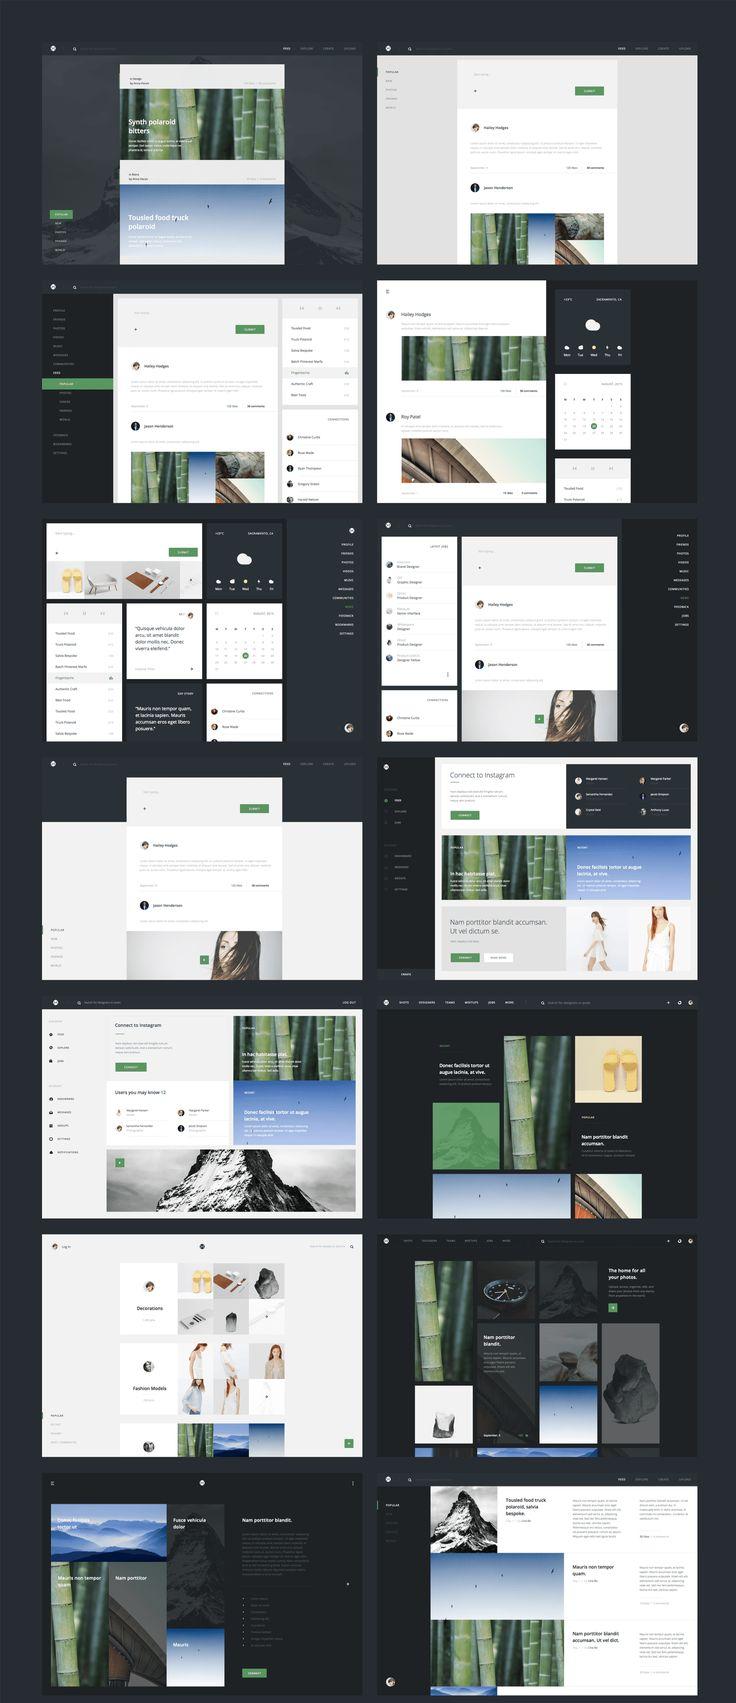 UI8 — Products — Avia UI Kit: Dashboard